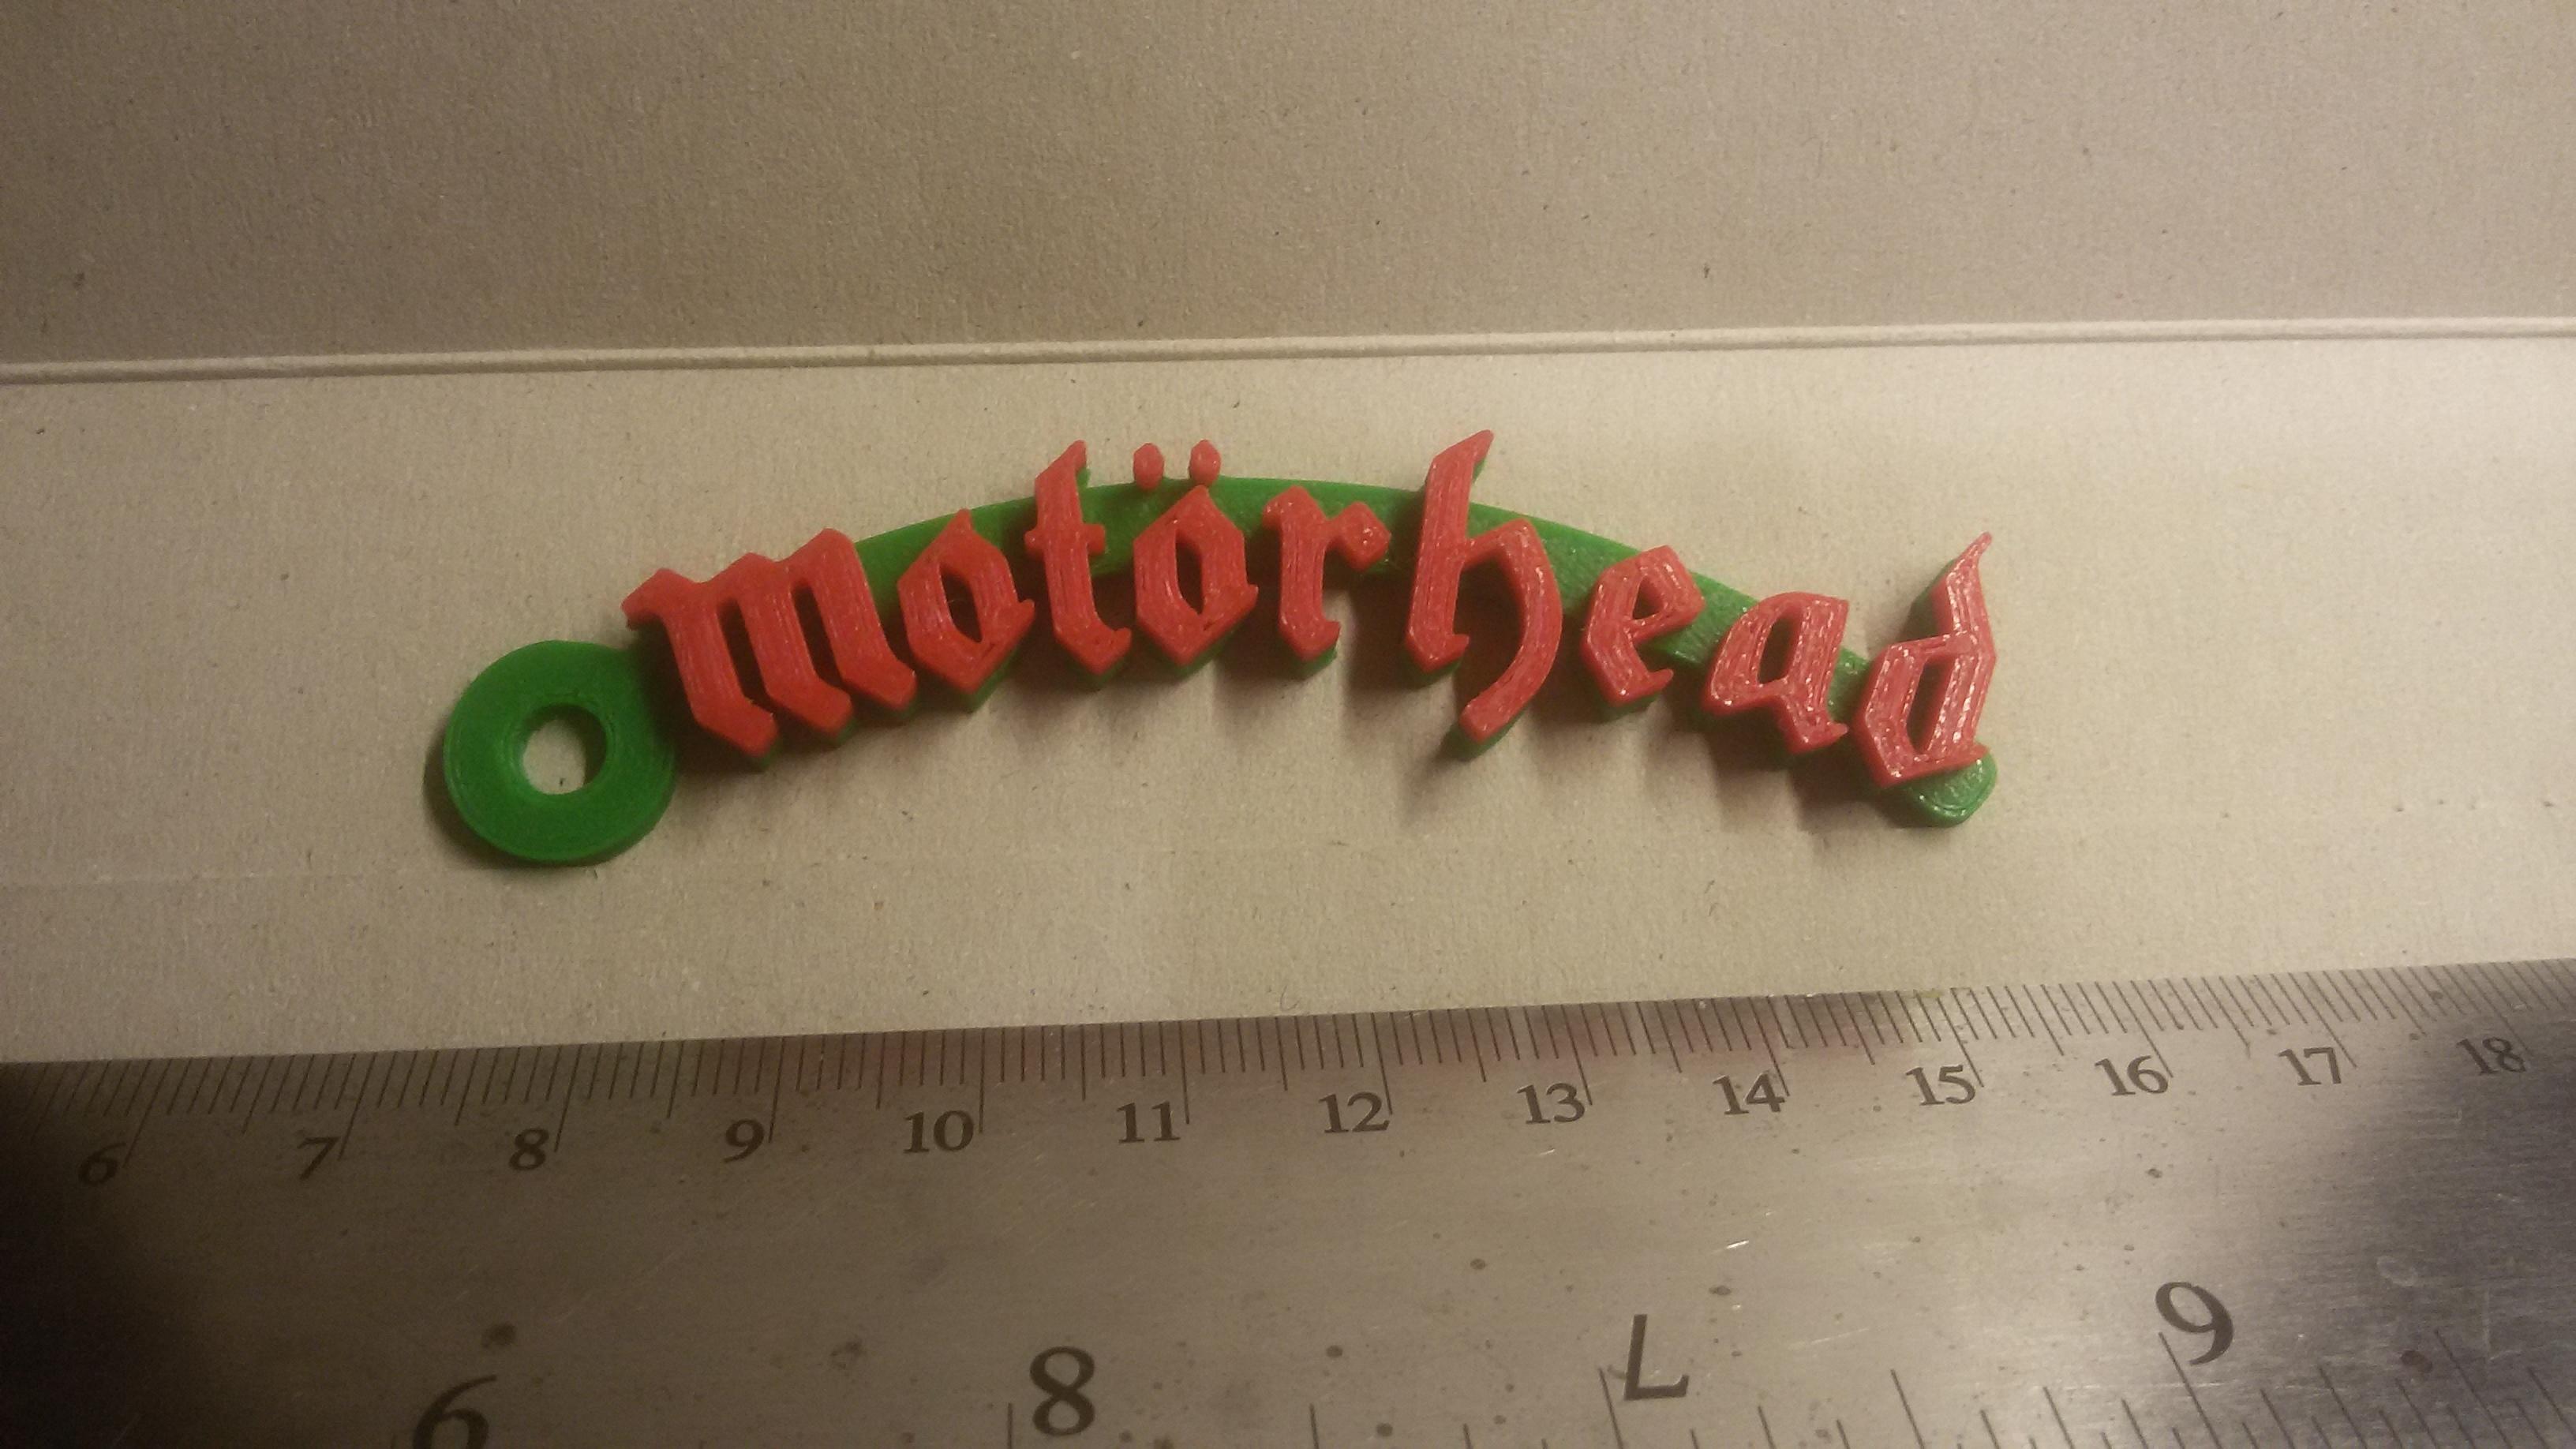 20180908_233342.jpg Download free STL file Motorhead Logo Keychain • 3D printable design, mcko